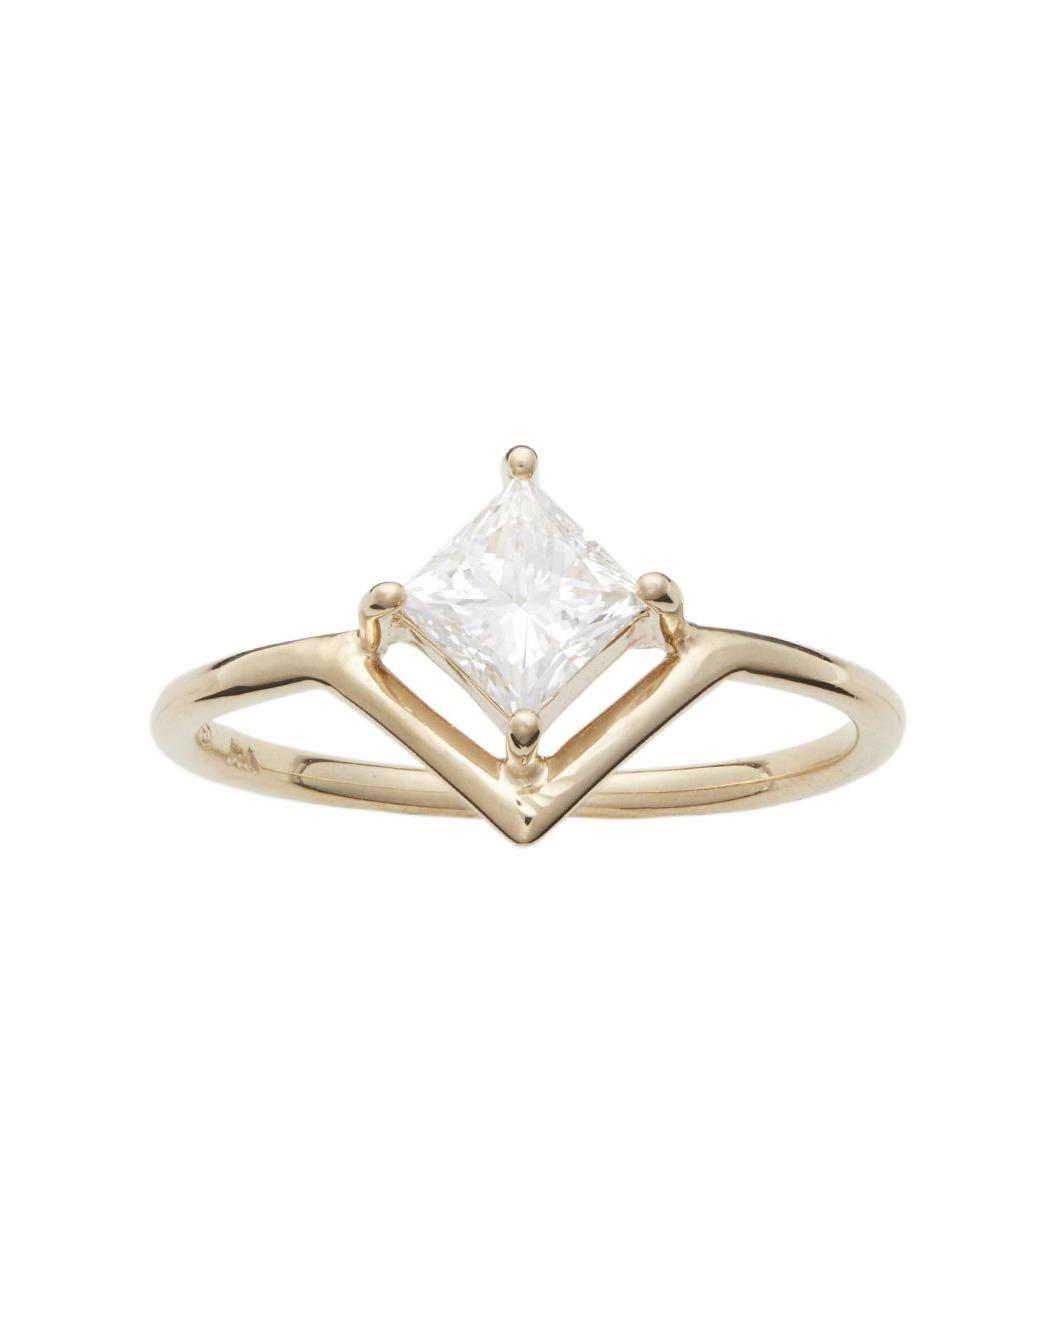 Nestled Princess-Cut Diamond Ring